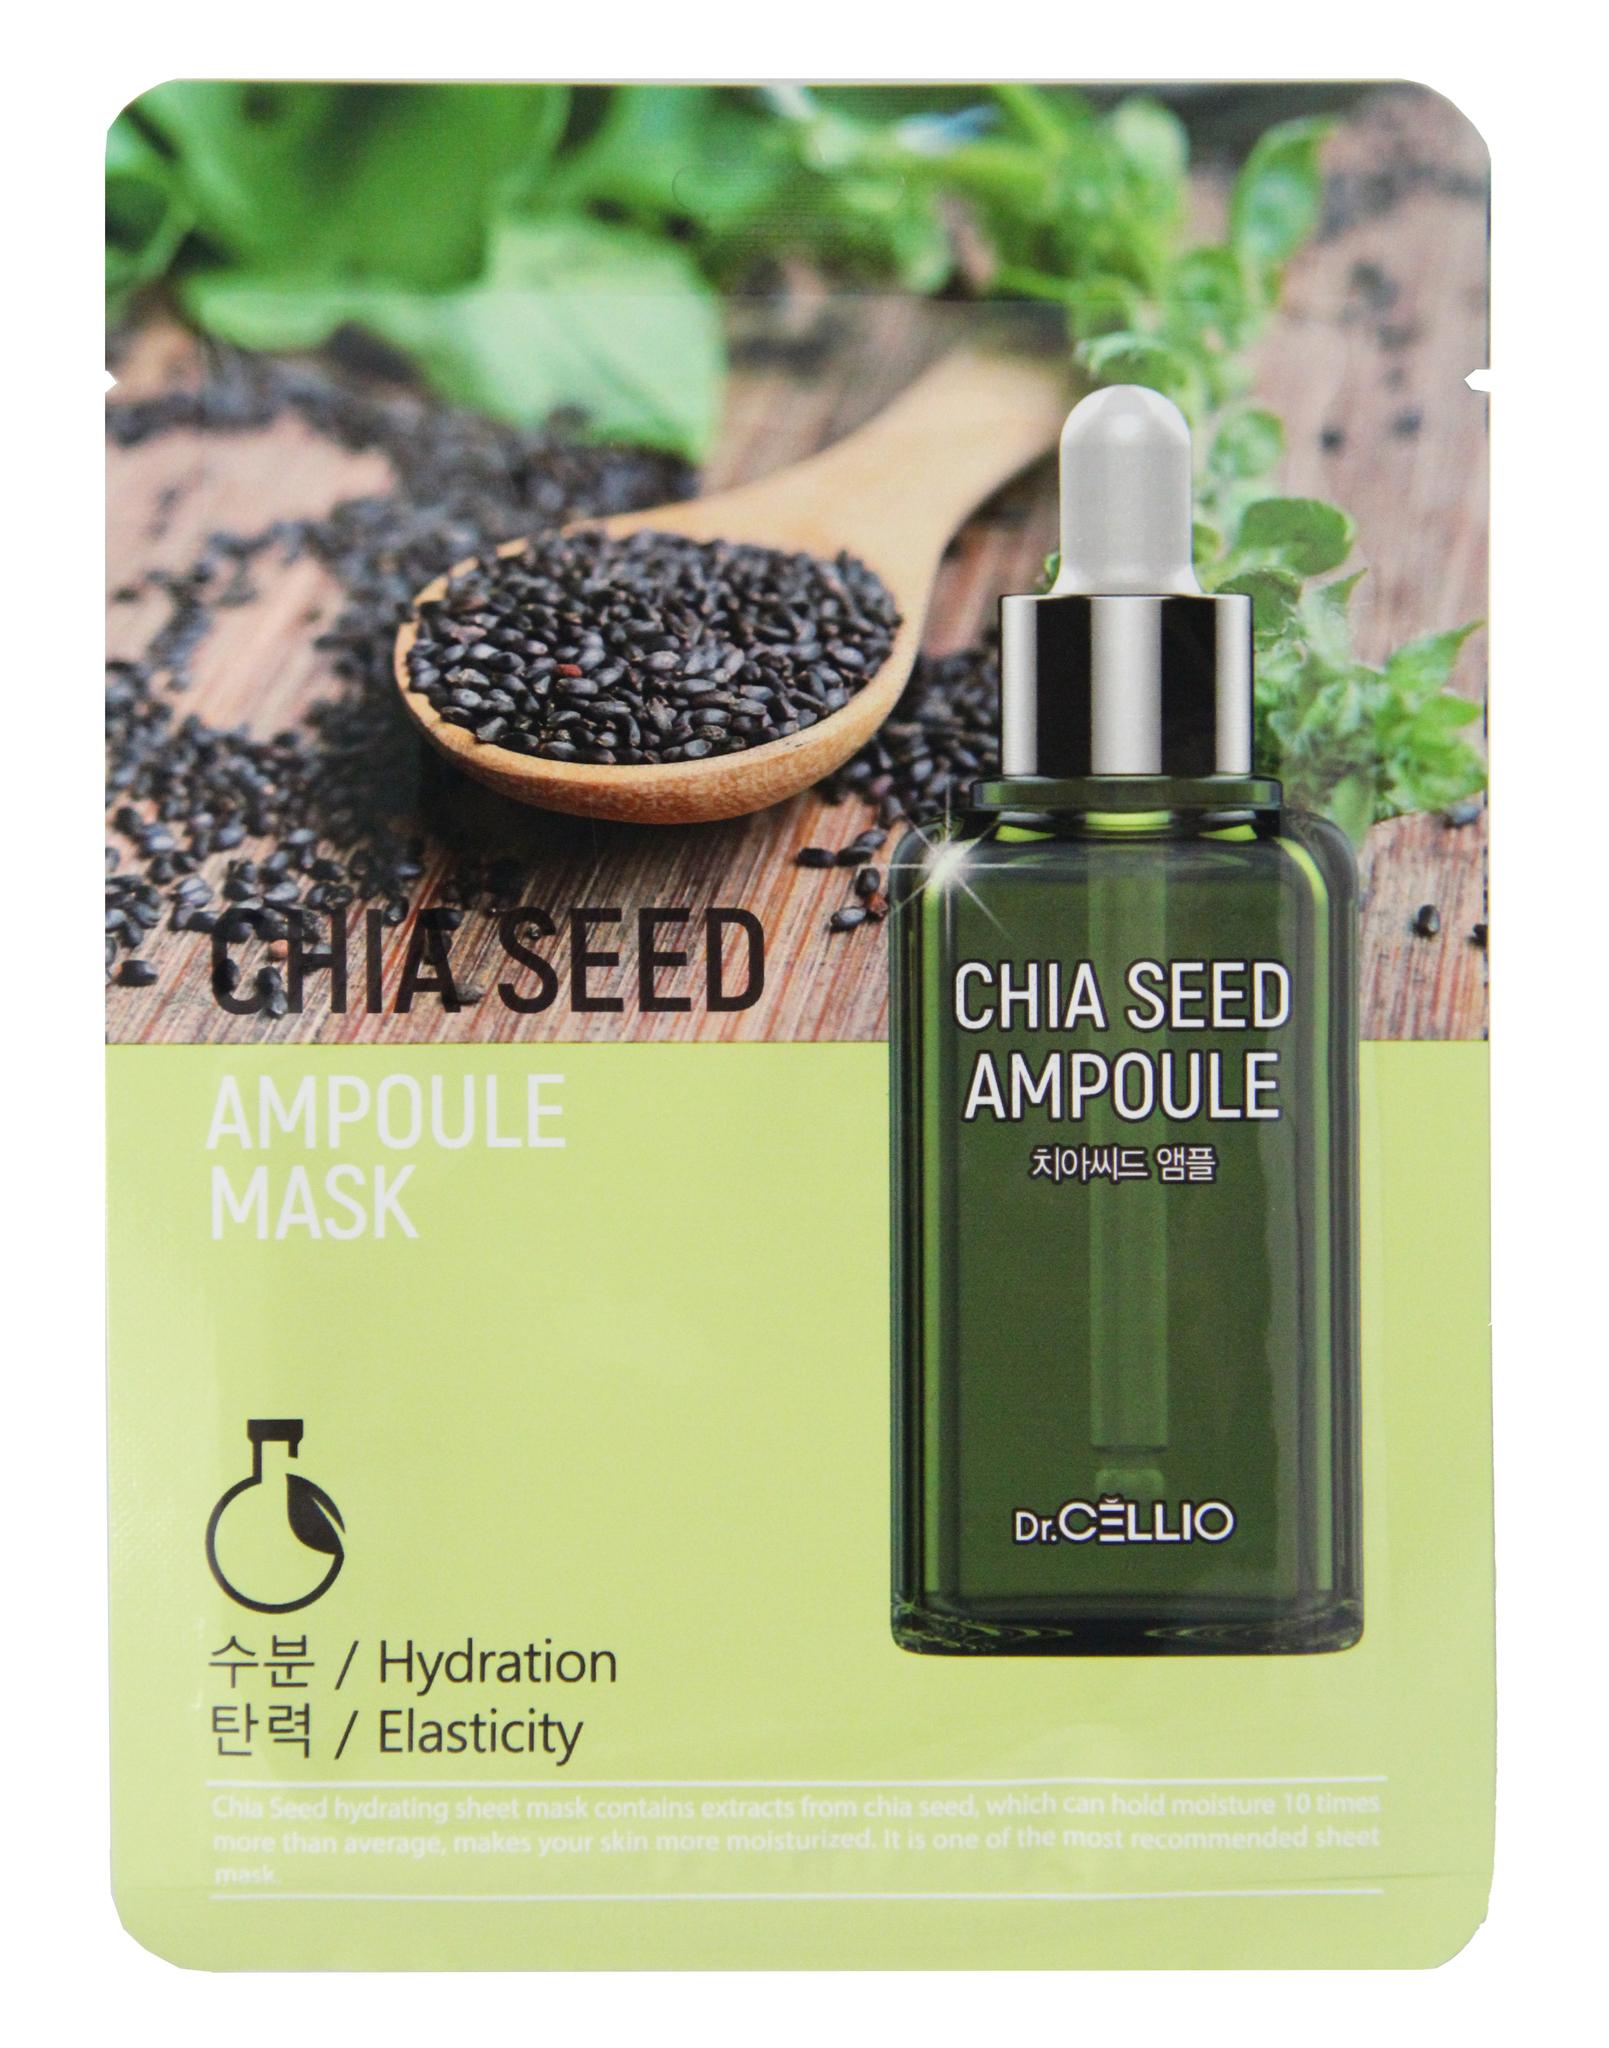 Тканевые Маска тканевая для лица с семенами чиа Dr. CELLIO CHIA SEED AMPOULE MASK 25 мл 2c95ecd3ce82fff5.jpeg